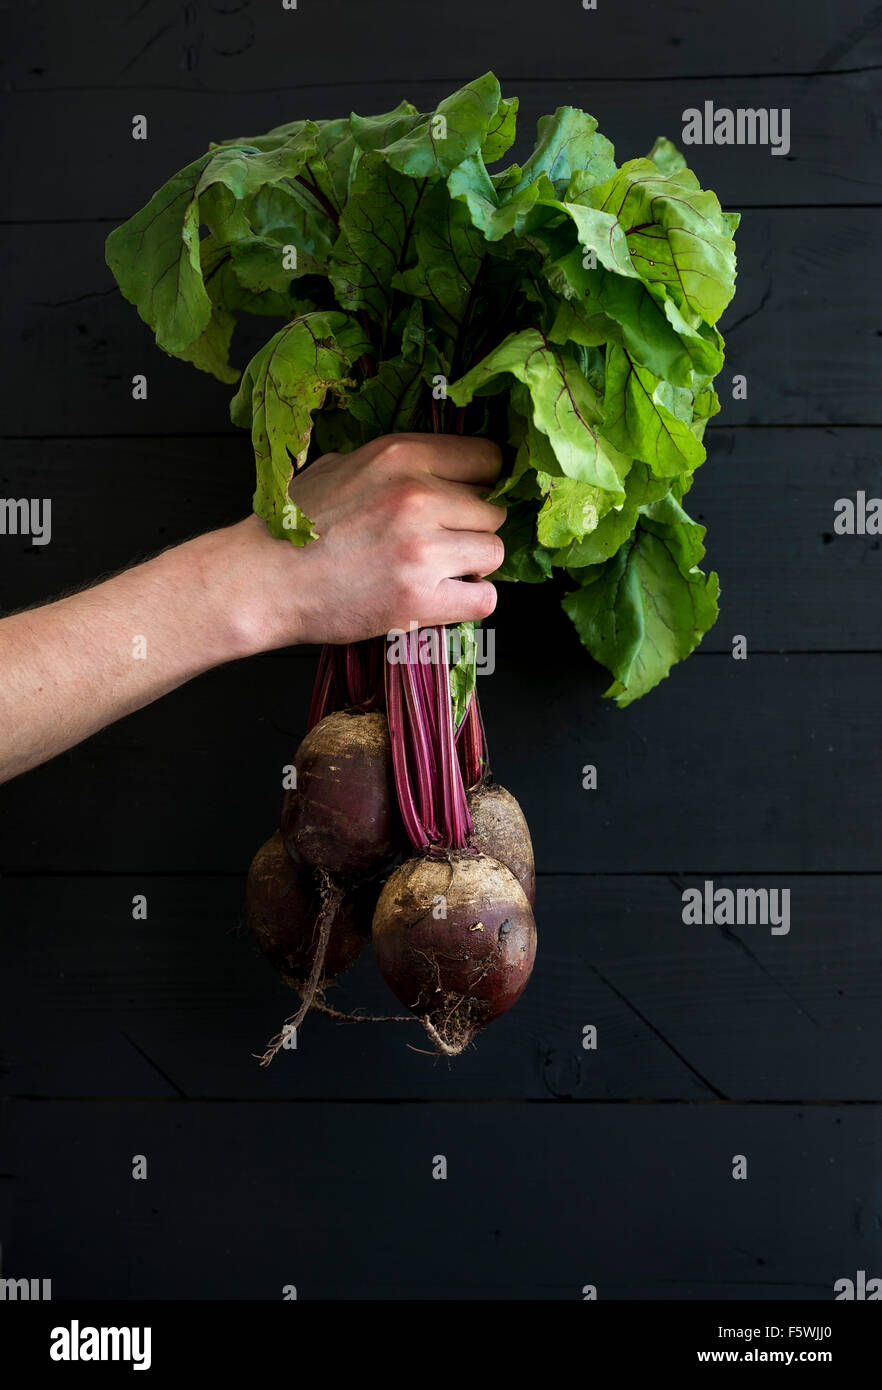 Bunch of fresh garden beetroot kept in man's hand, black wooden backdrop. - Stock Image